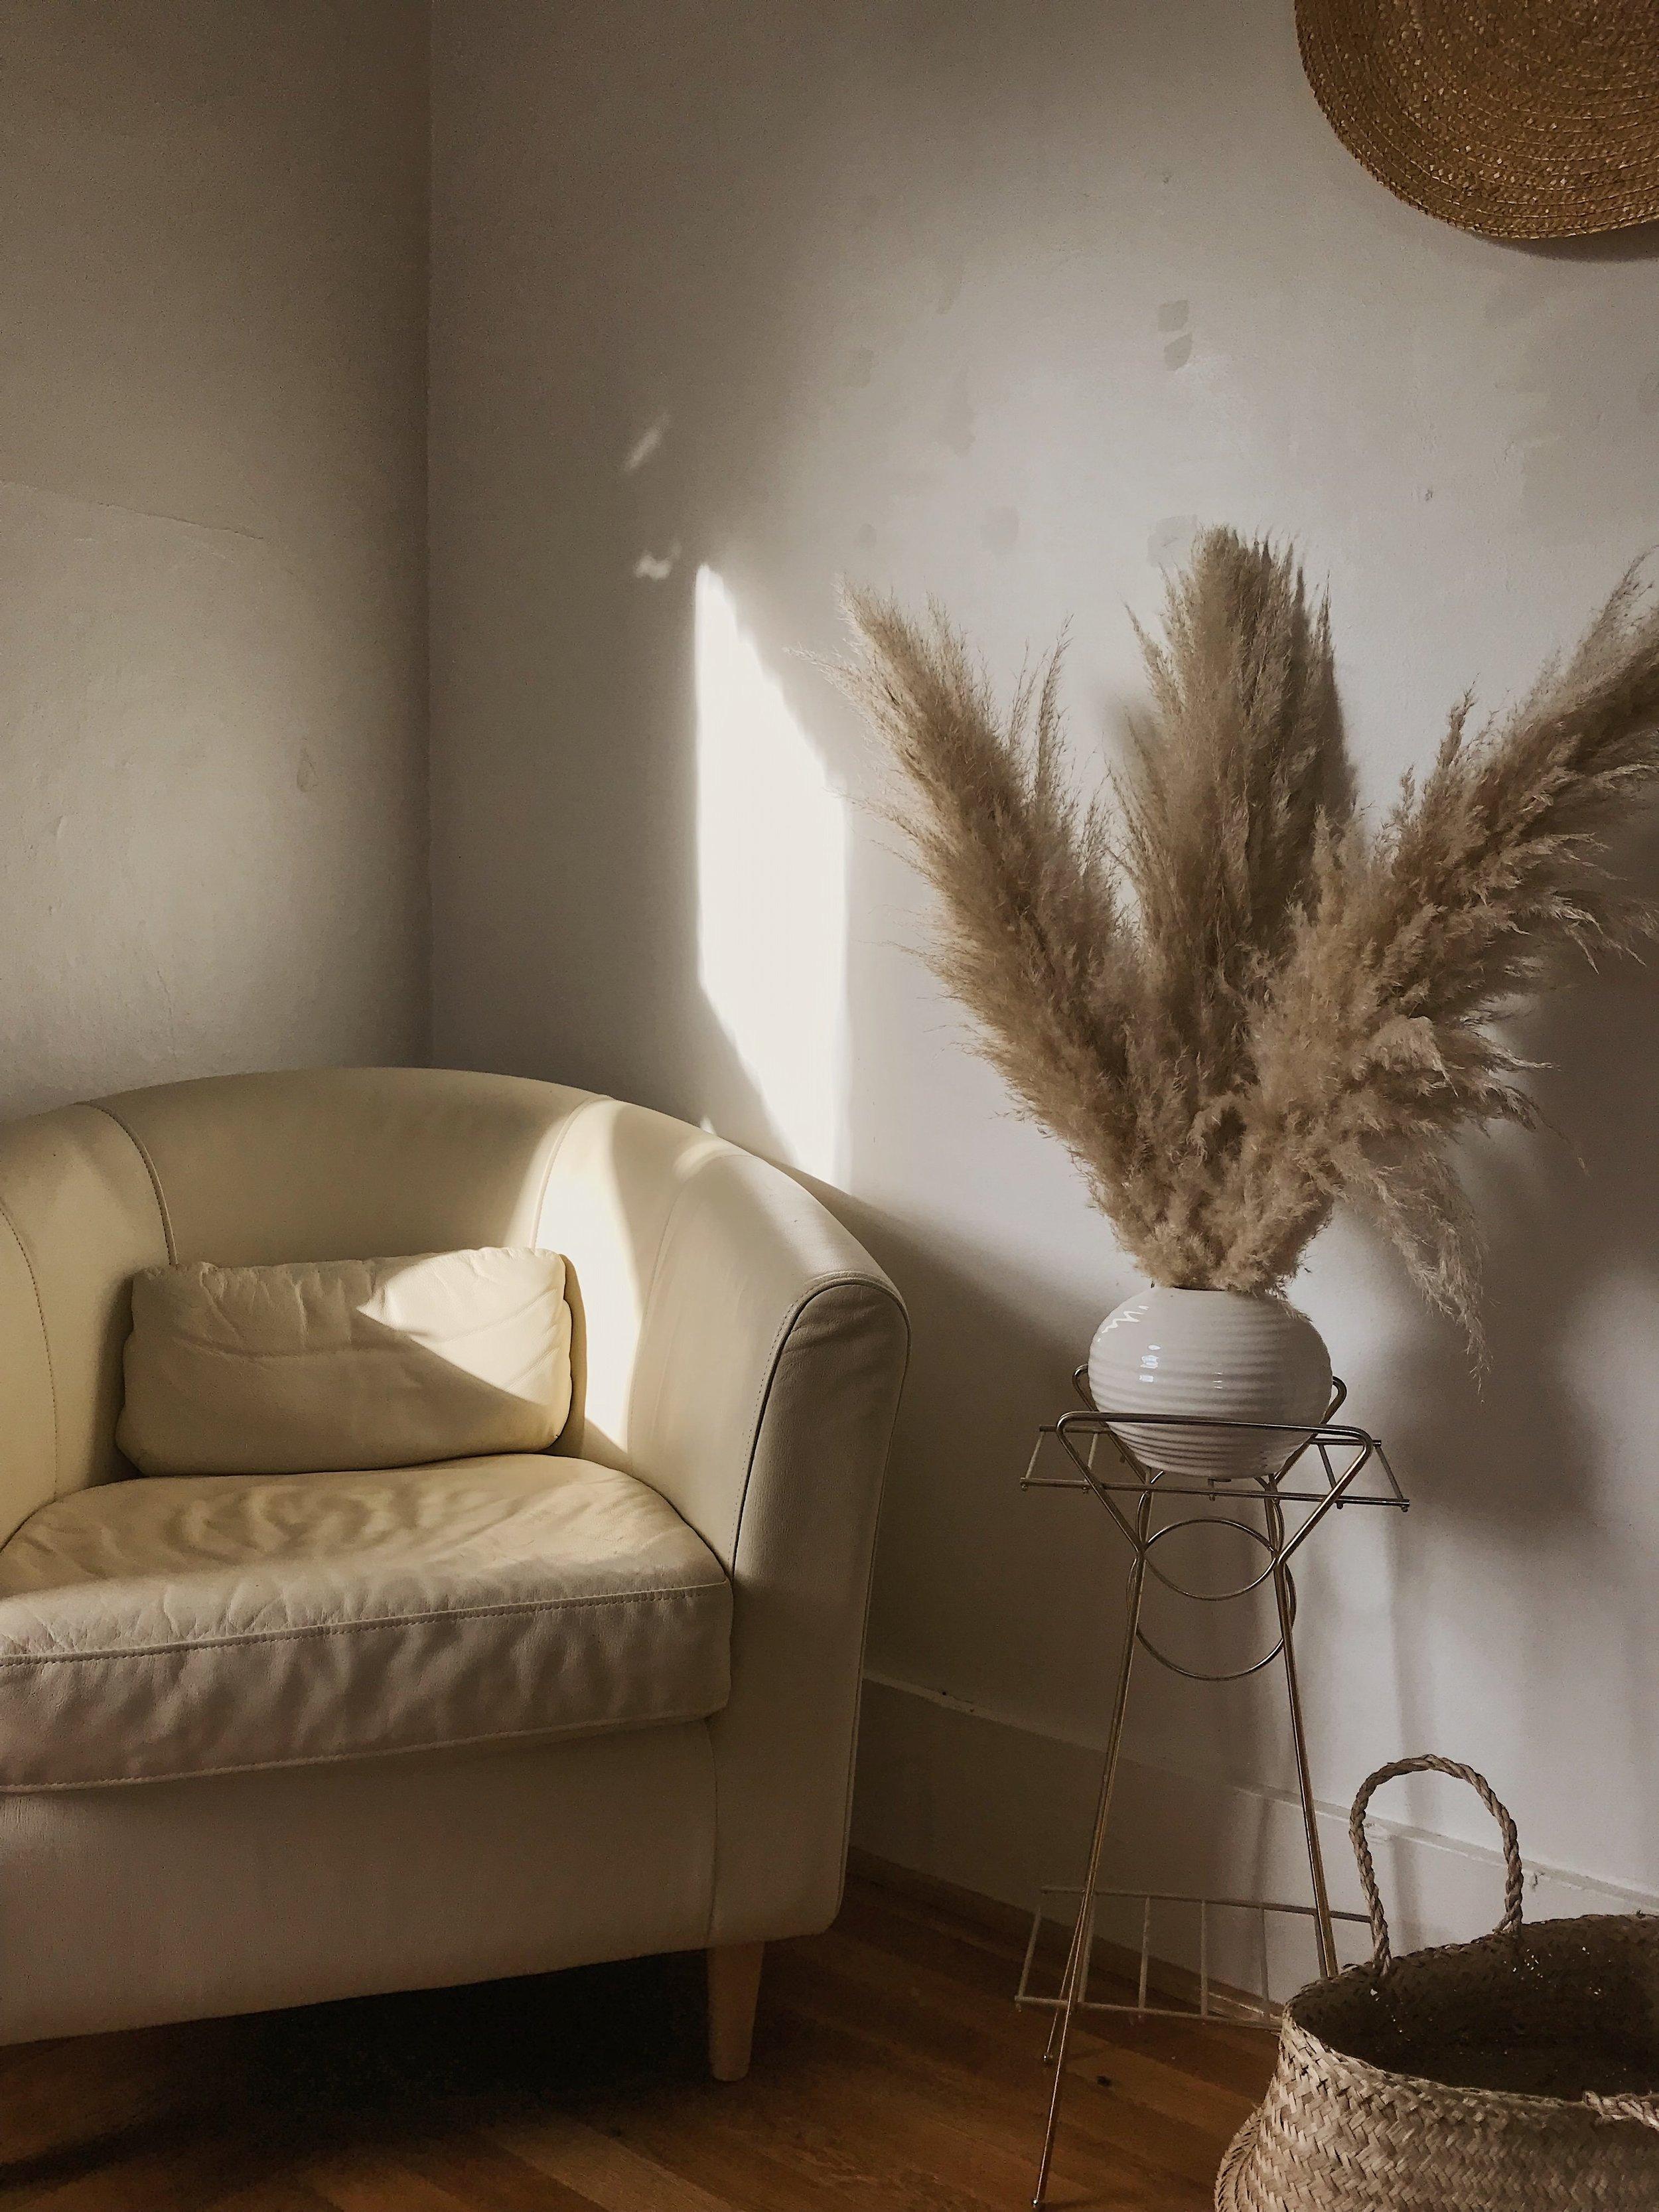 creamchair-08.jpg